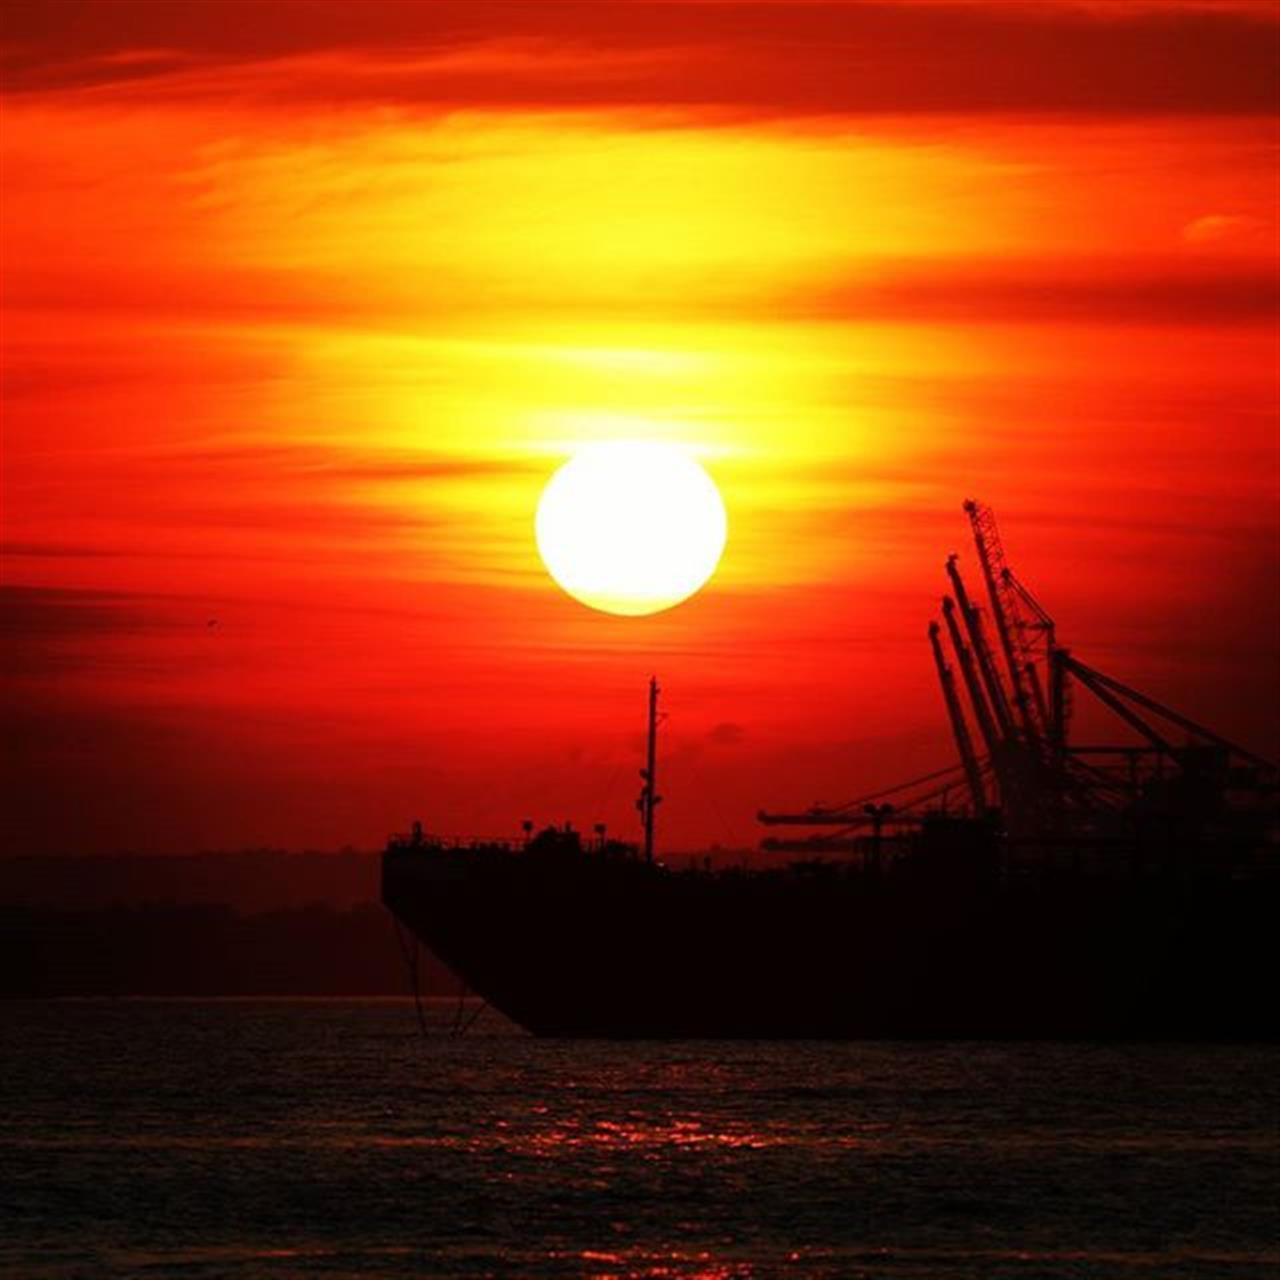 Sunset in #SunsetPark  #brooklynarmyterminal